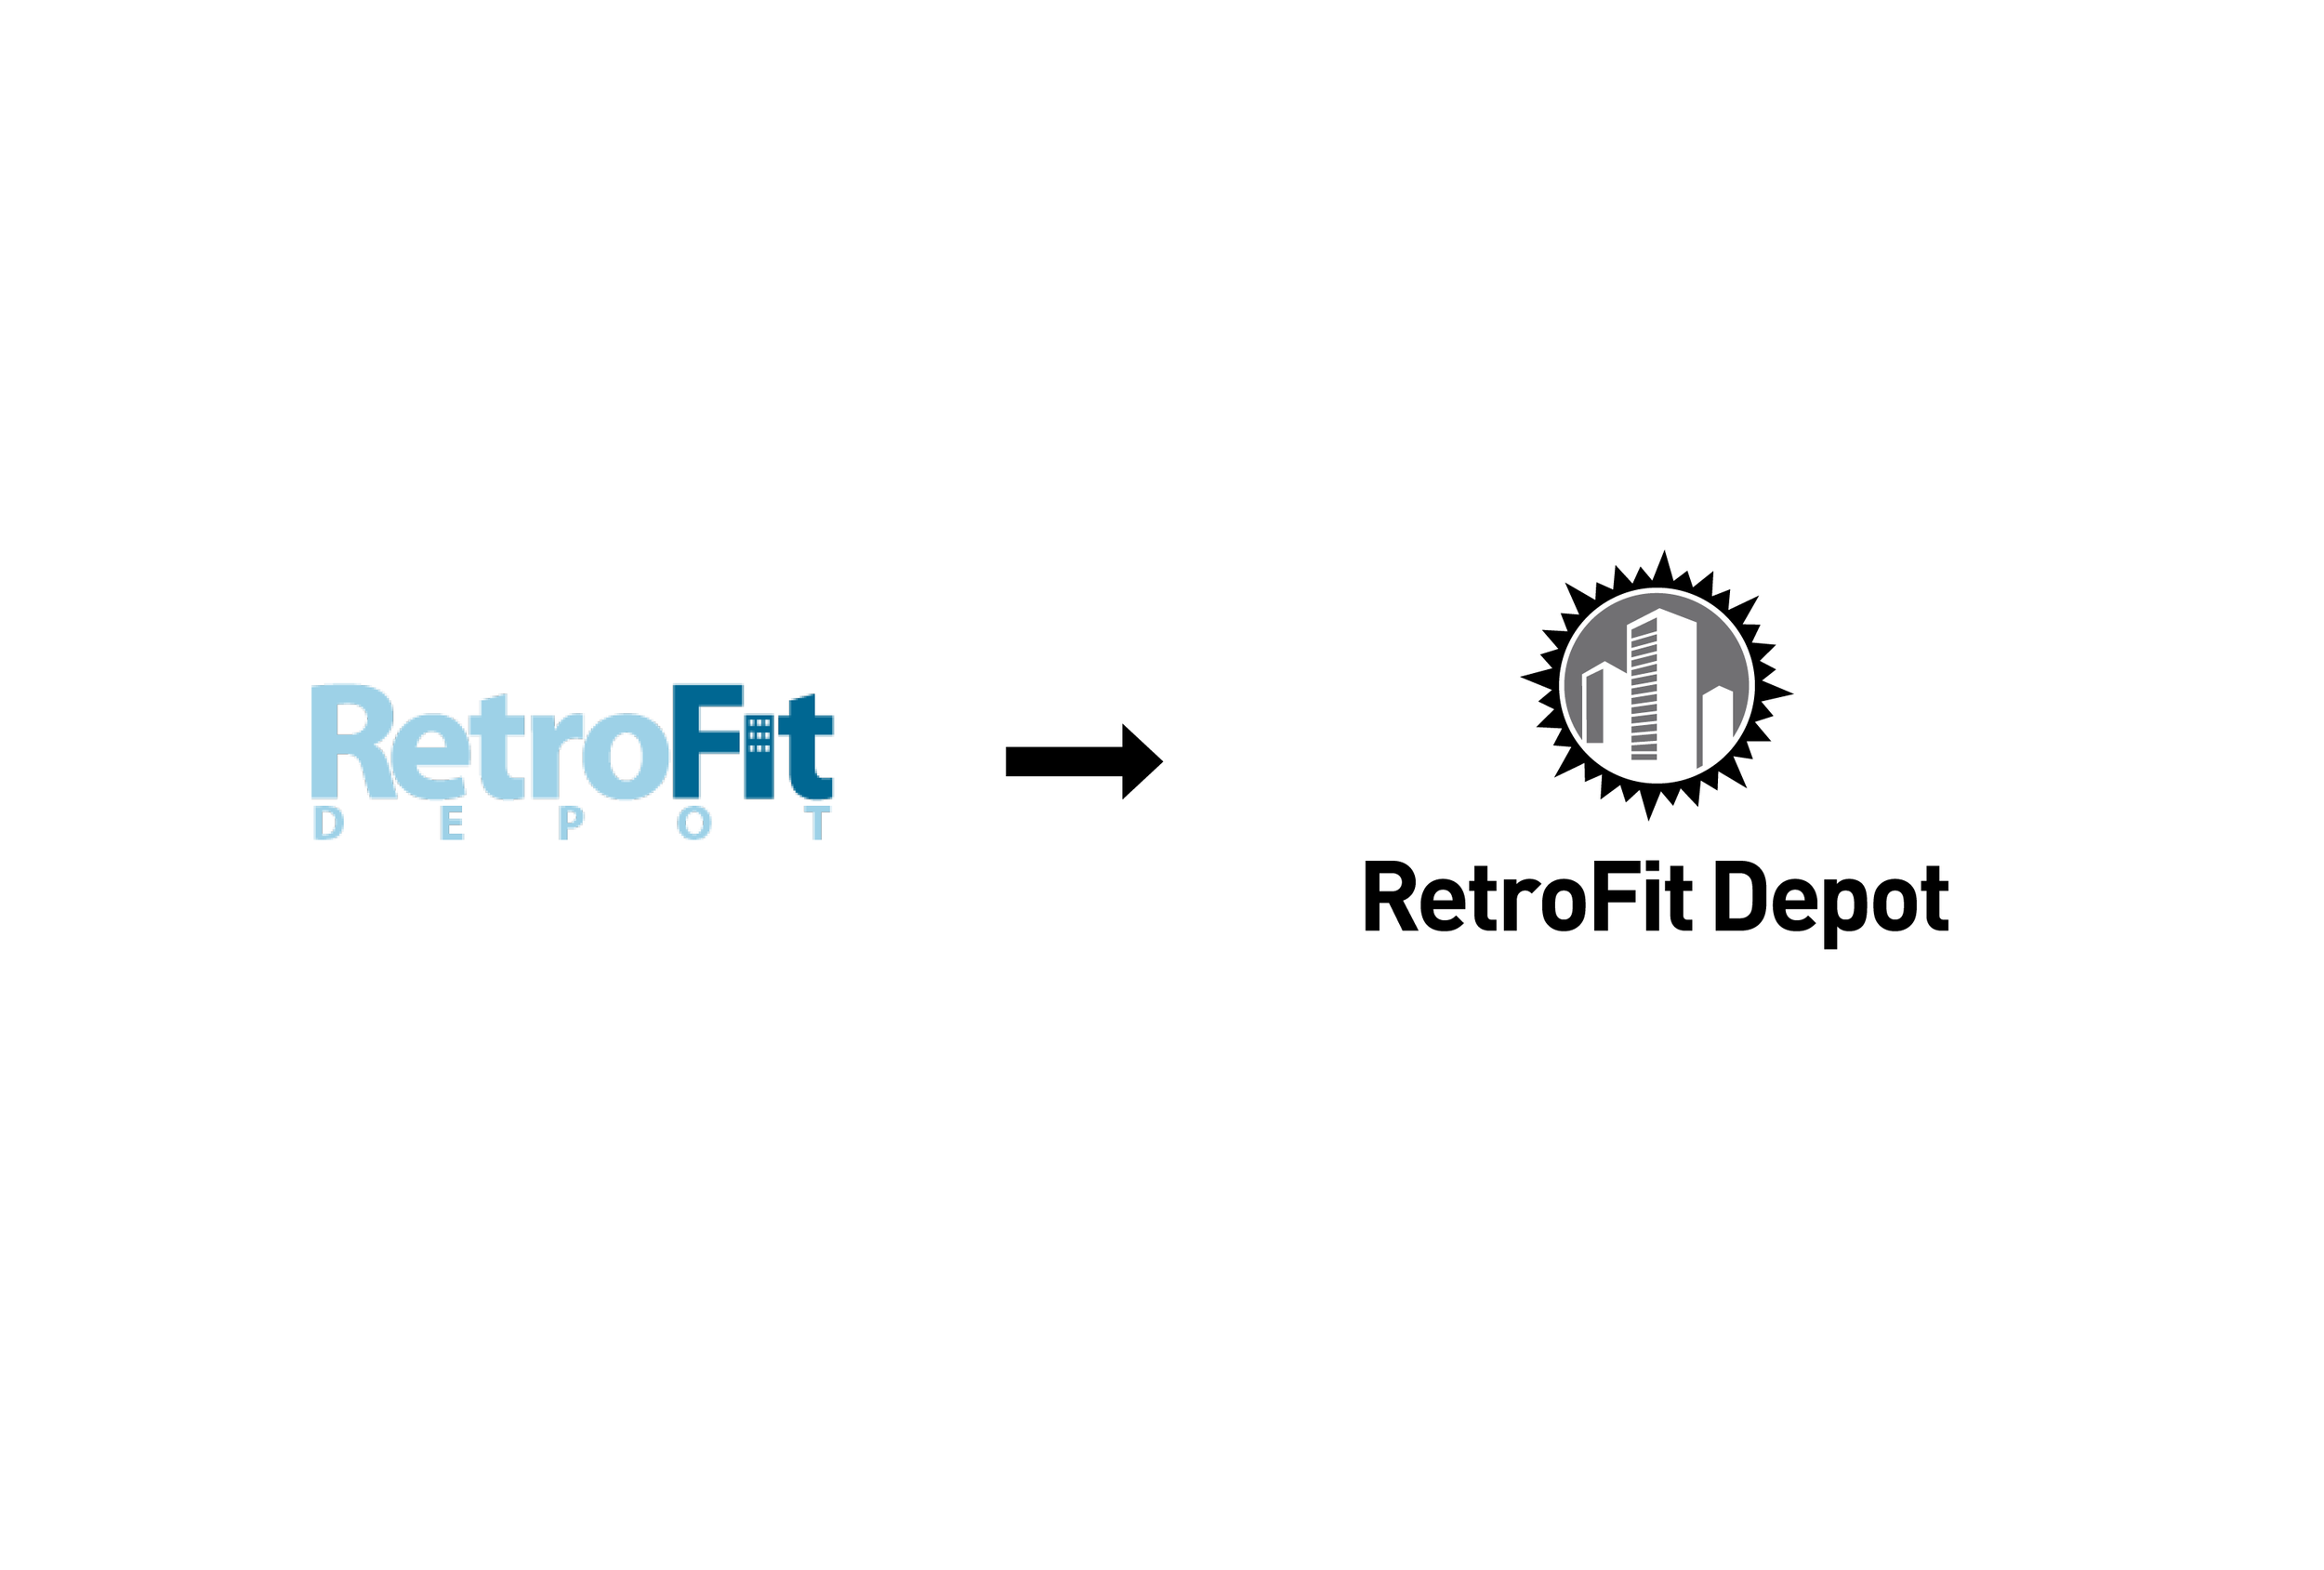 RetroFit Depot logo (recommended).